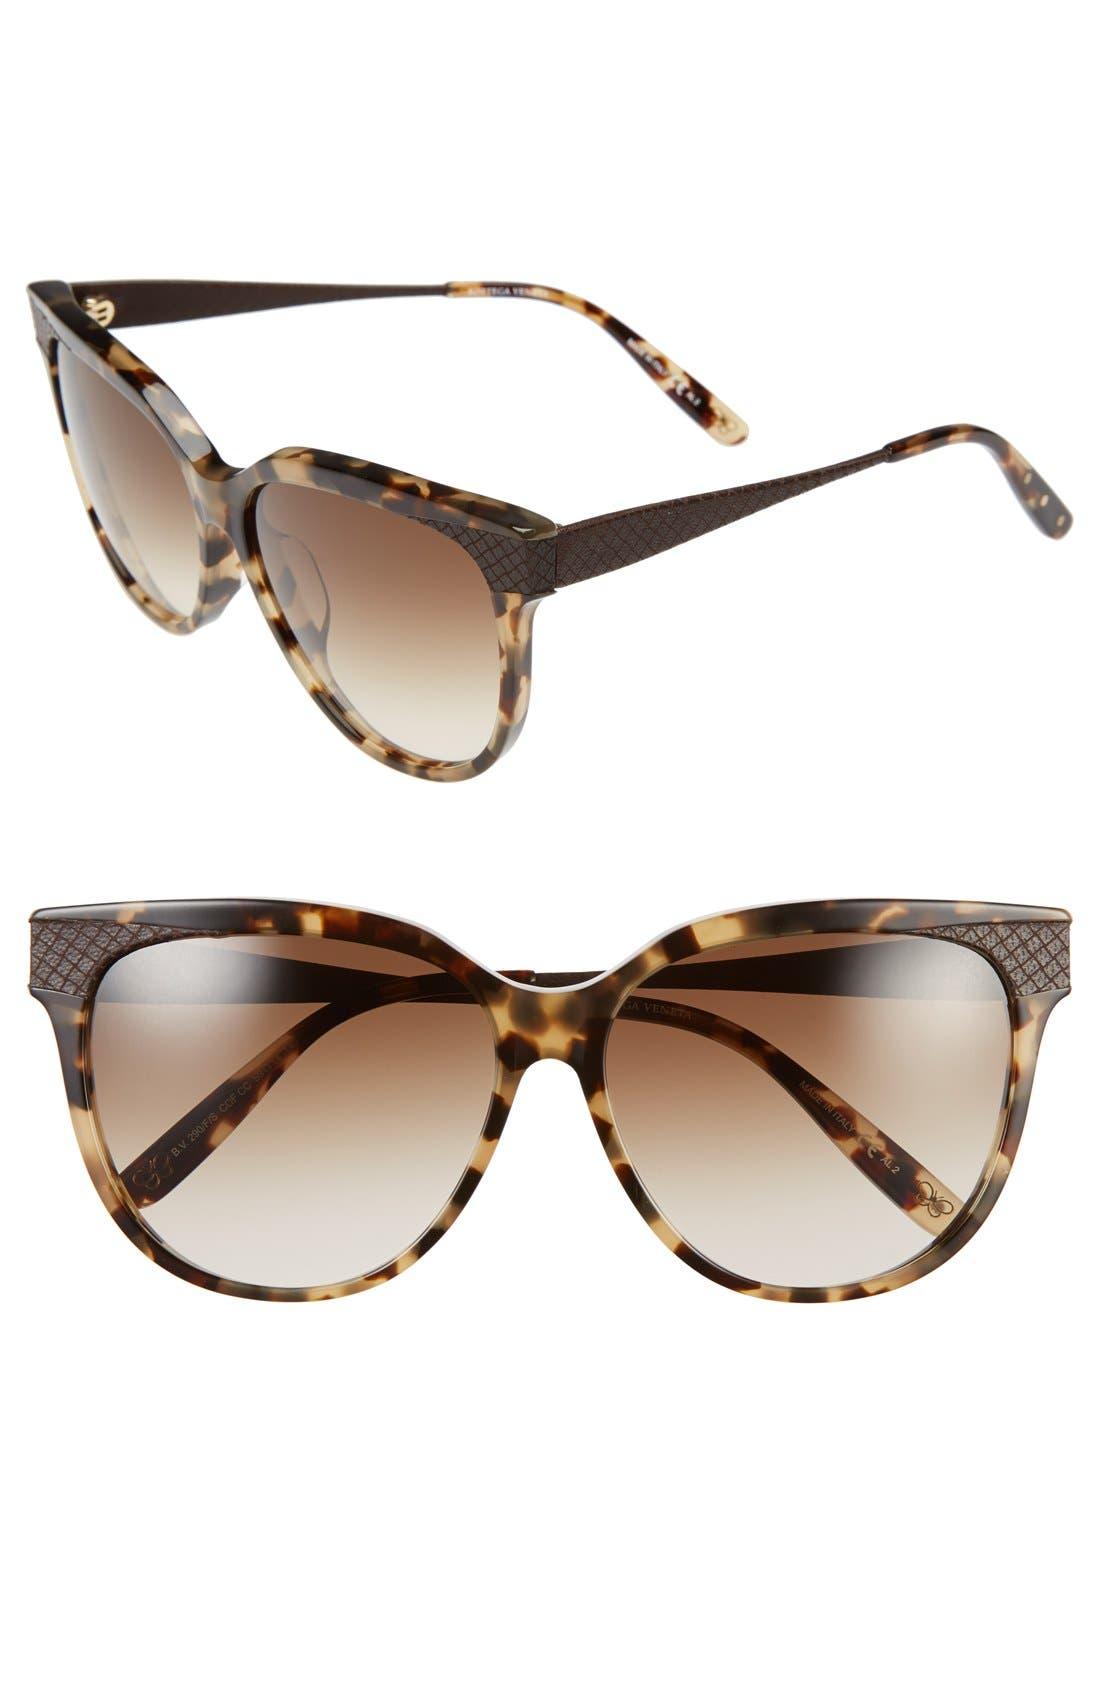 Main Image - Bottega Venata 59mm Special Fit Sunglasses